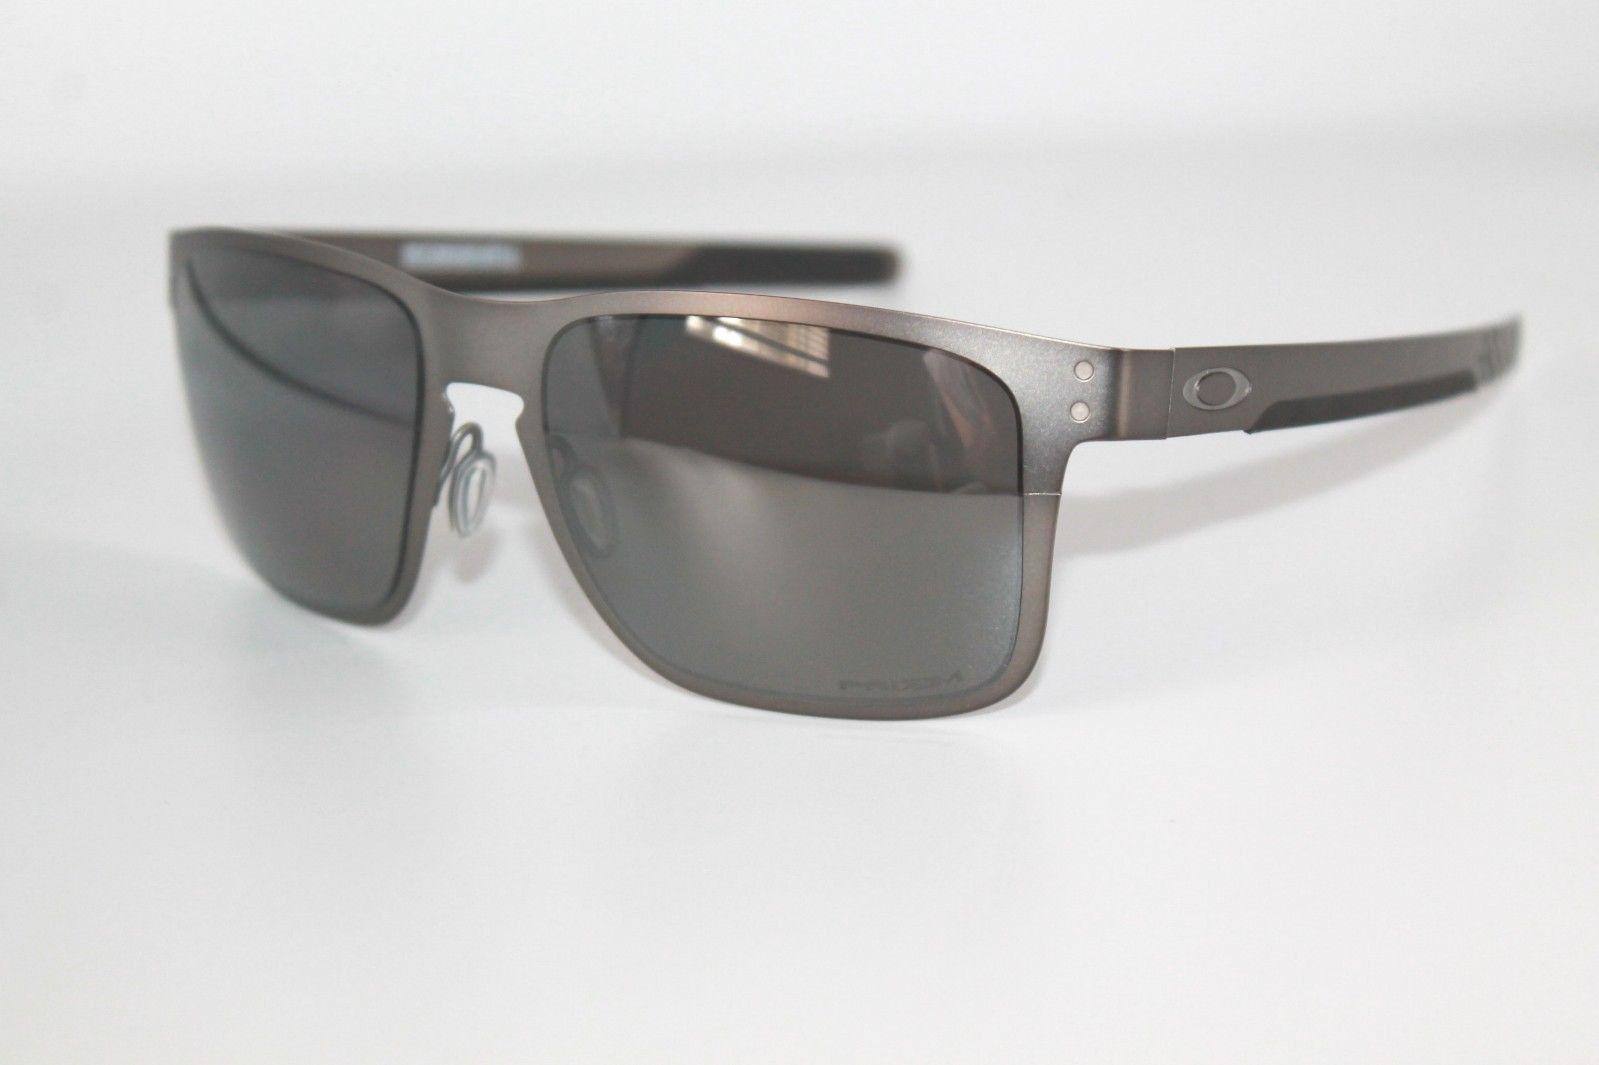 4f90c979753 Oakley Holbrook Metal Polarized Sunglasses and 50 similar items. 57